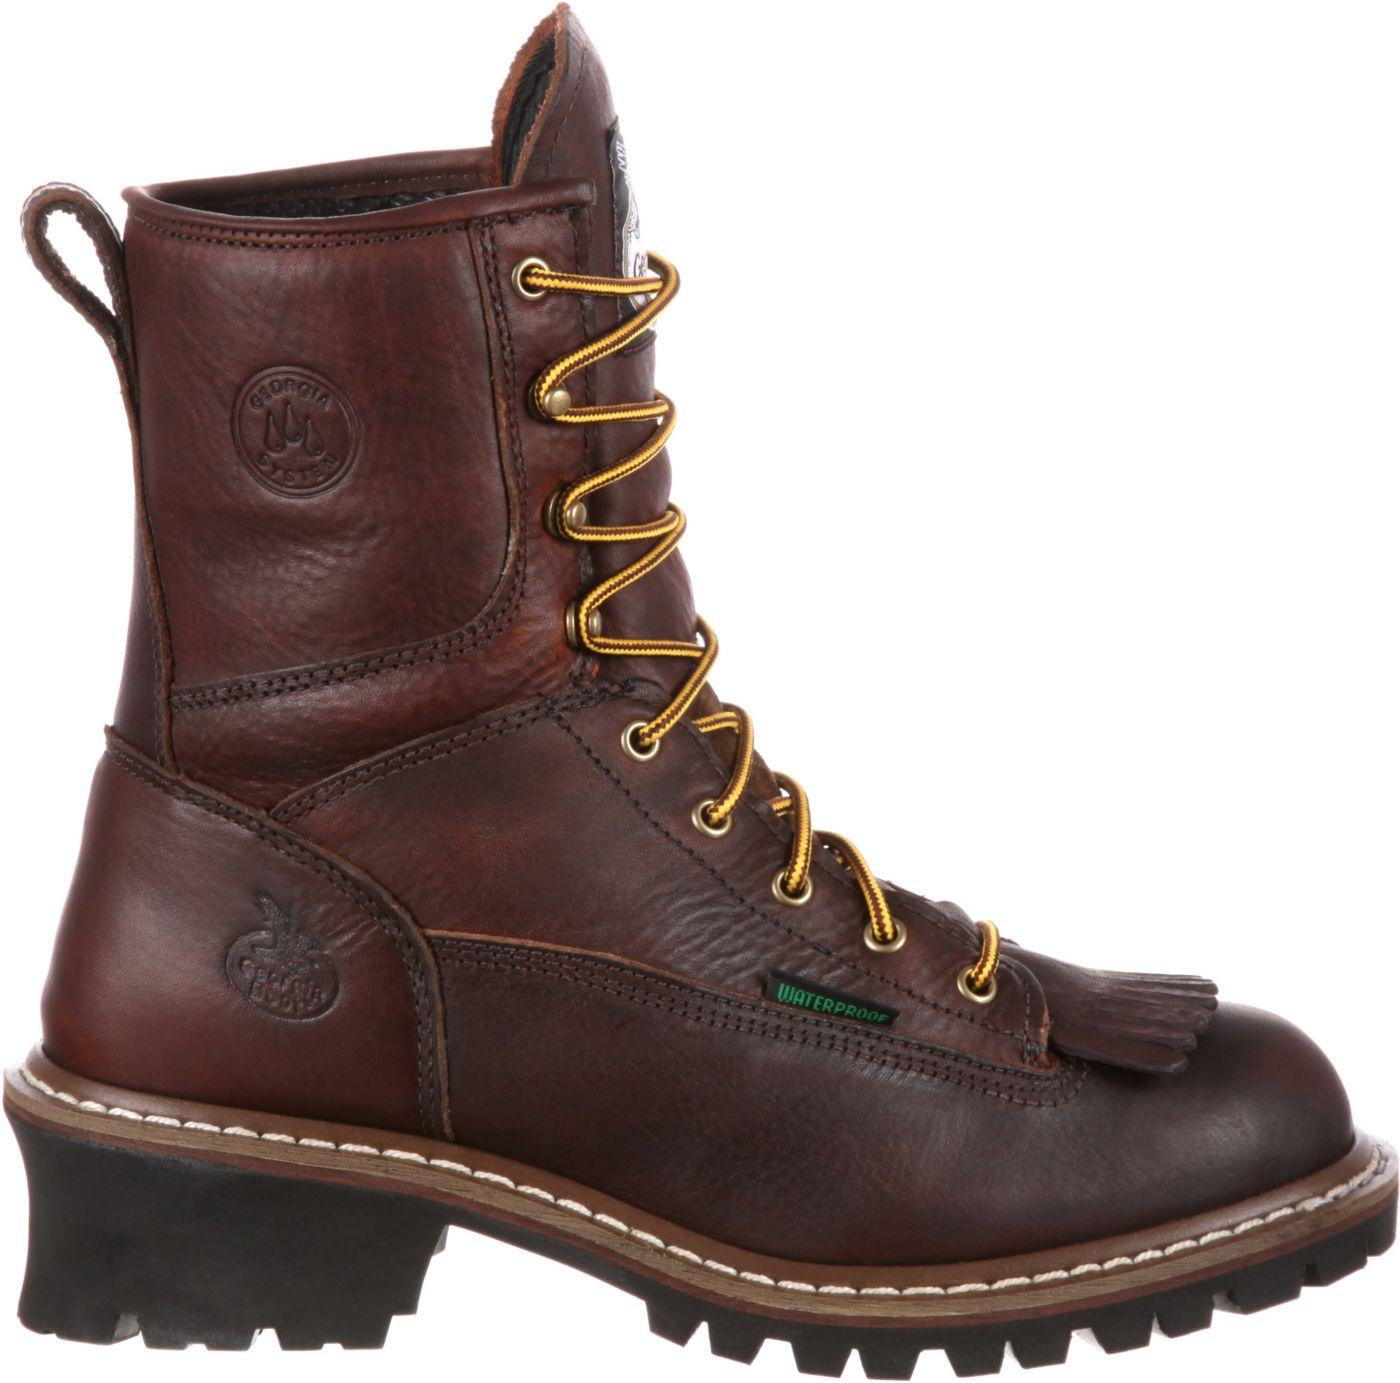 Georgia Boot Men's Waterproof Logger Work Boots